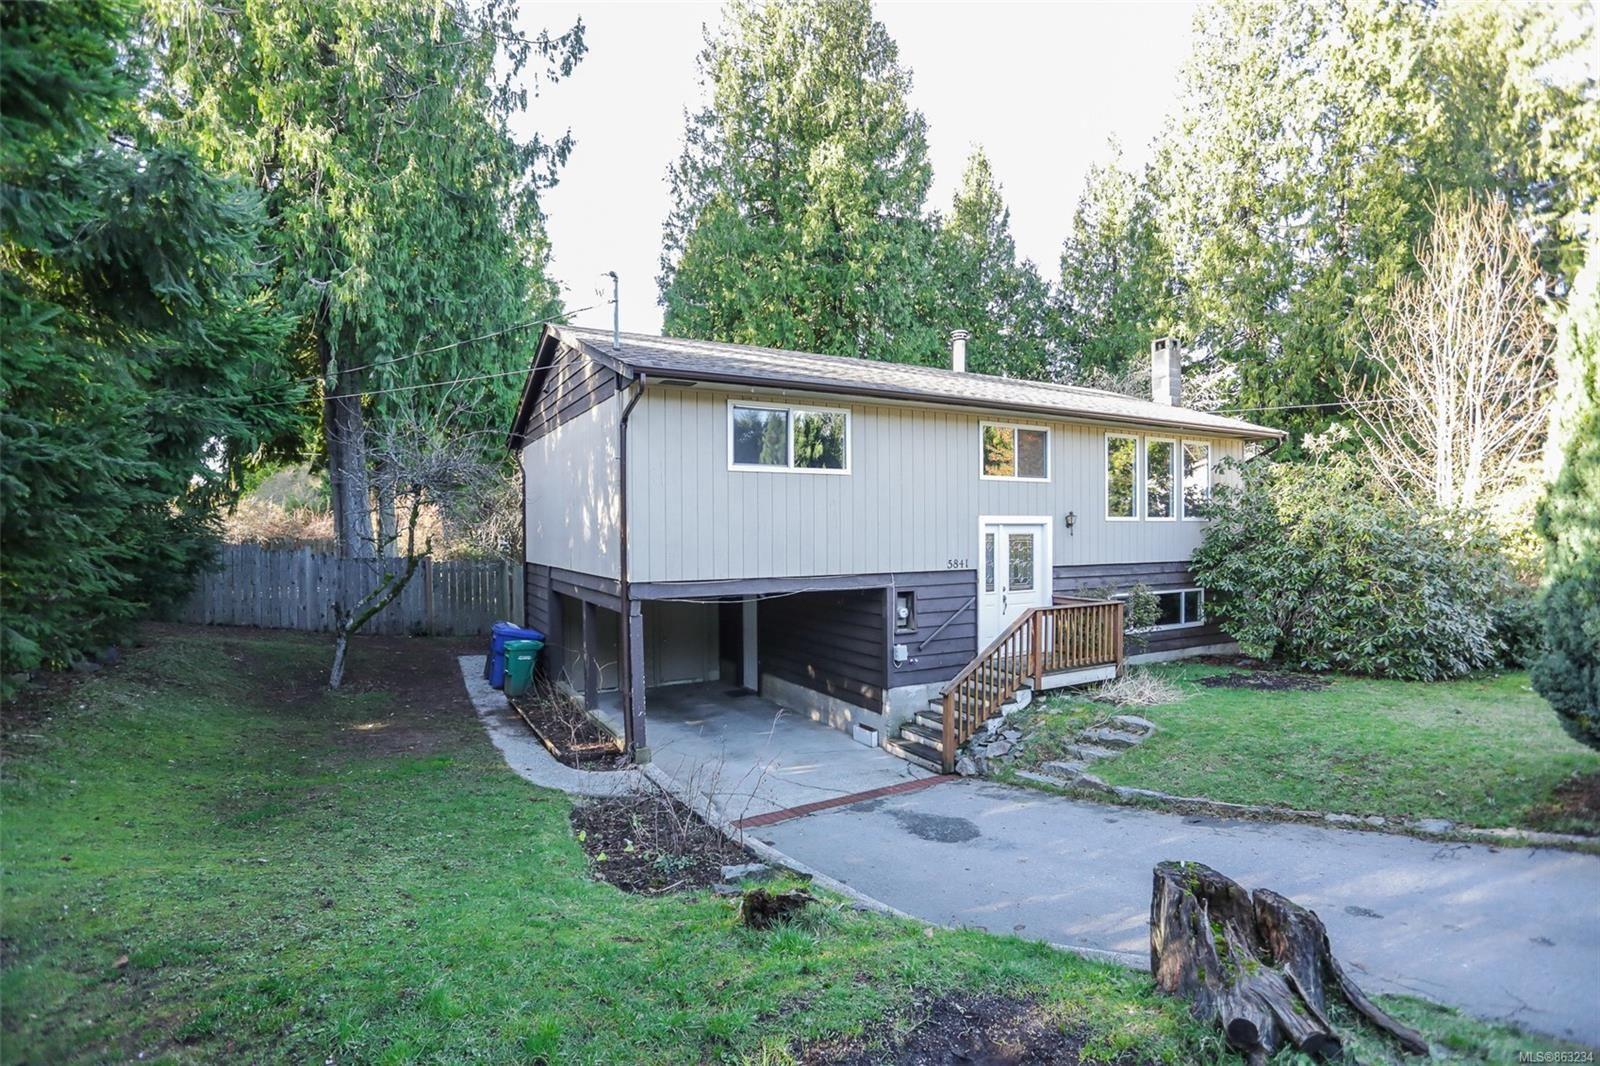 Main Photo: 5841 Parkway Dr in : Na North Nanaimo House for sale (Nanaimo)  : MLS®# 863234